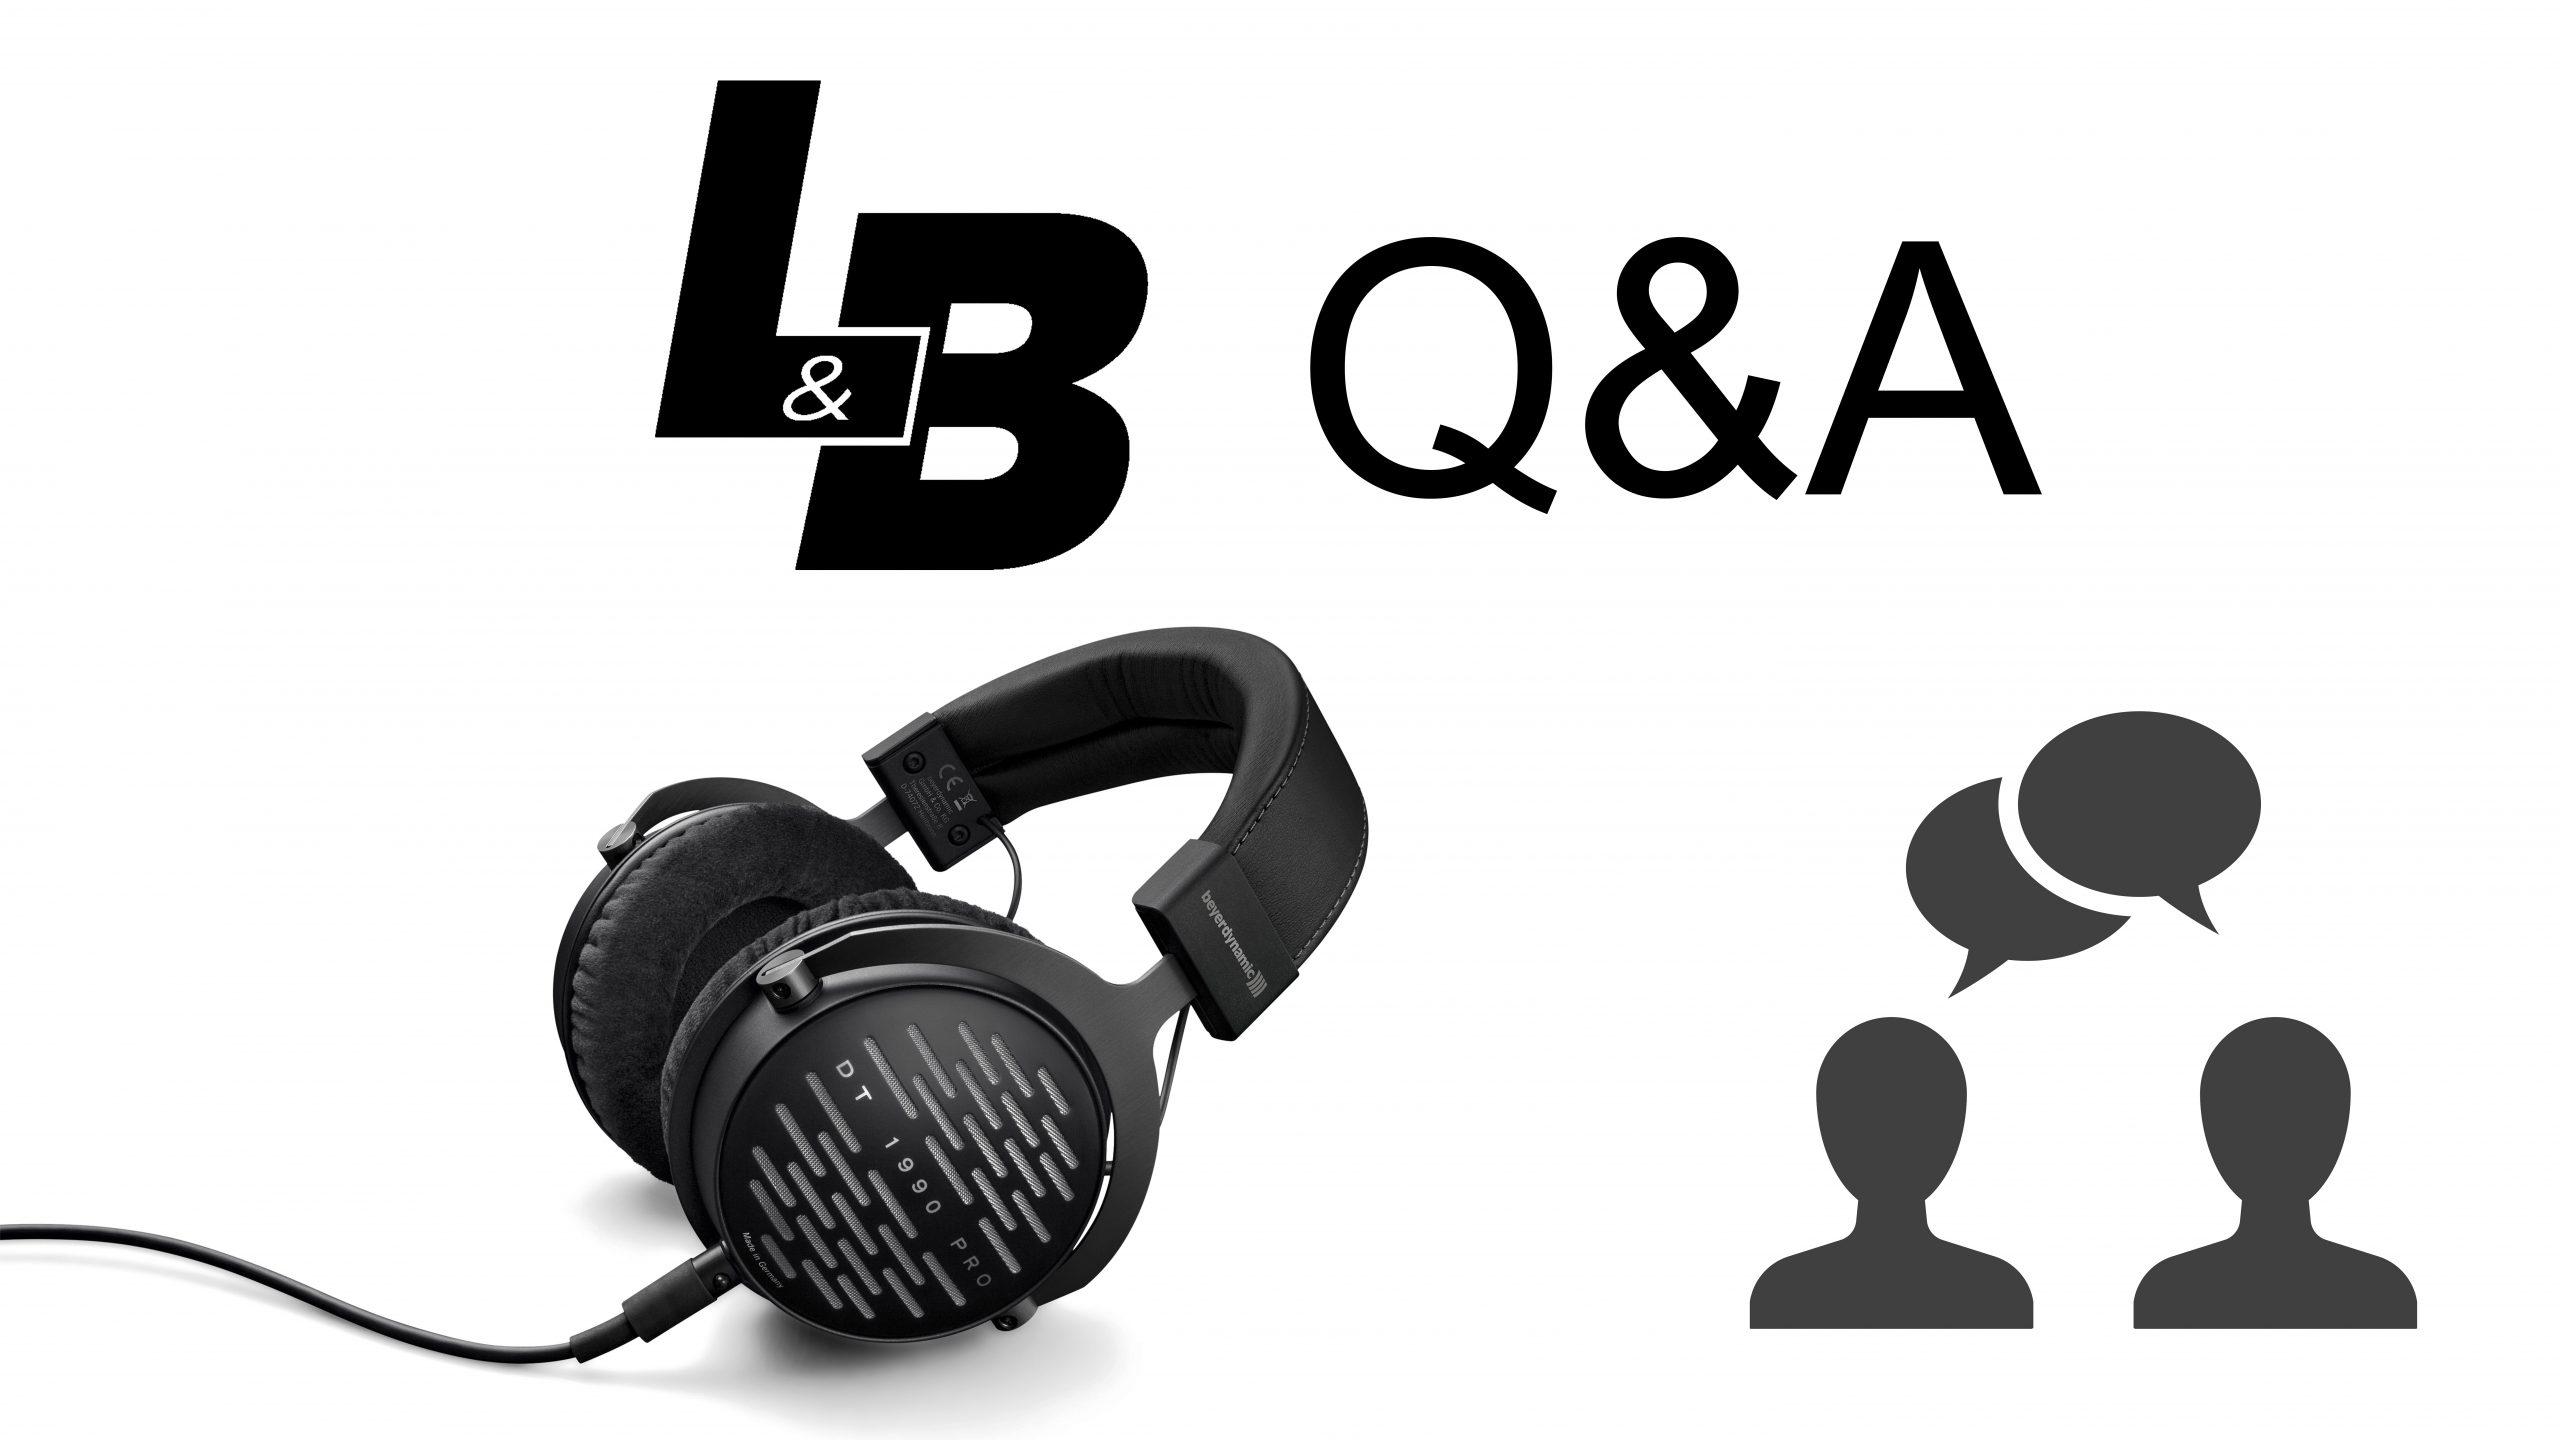 L&B Lyd & Bilde Q&A live